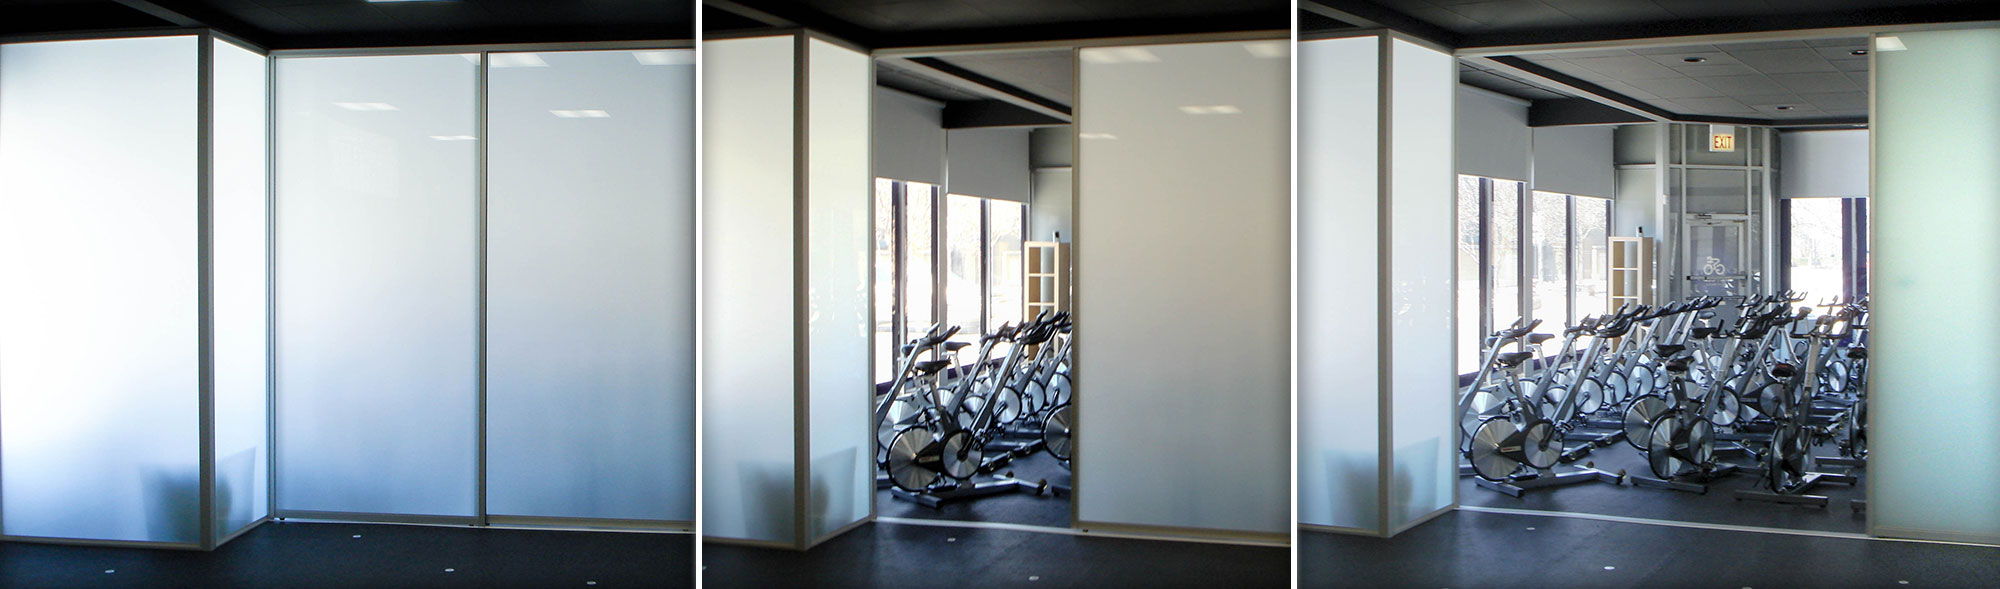 Creative Mirror & Shower of Chicago | Mirrors, Shower Doors & Glass